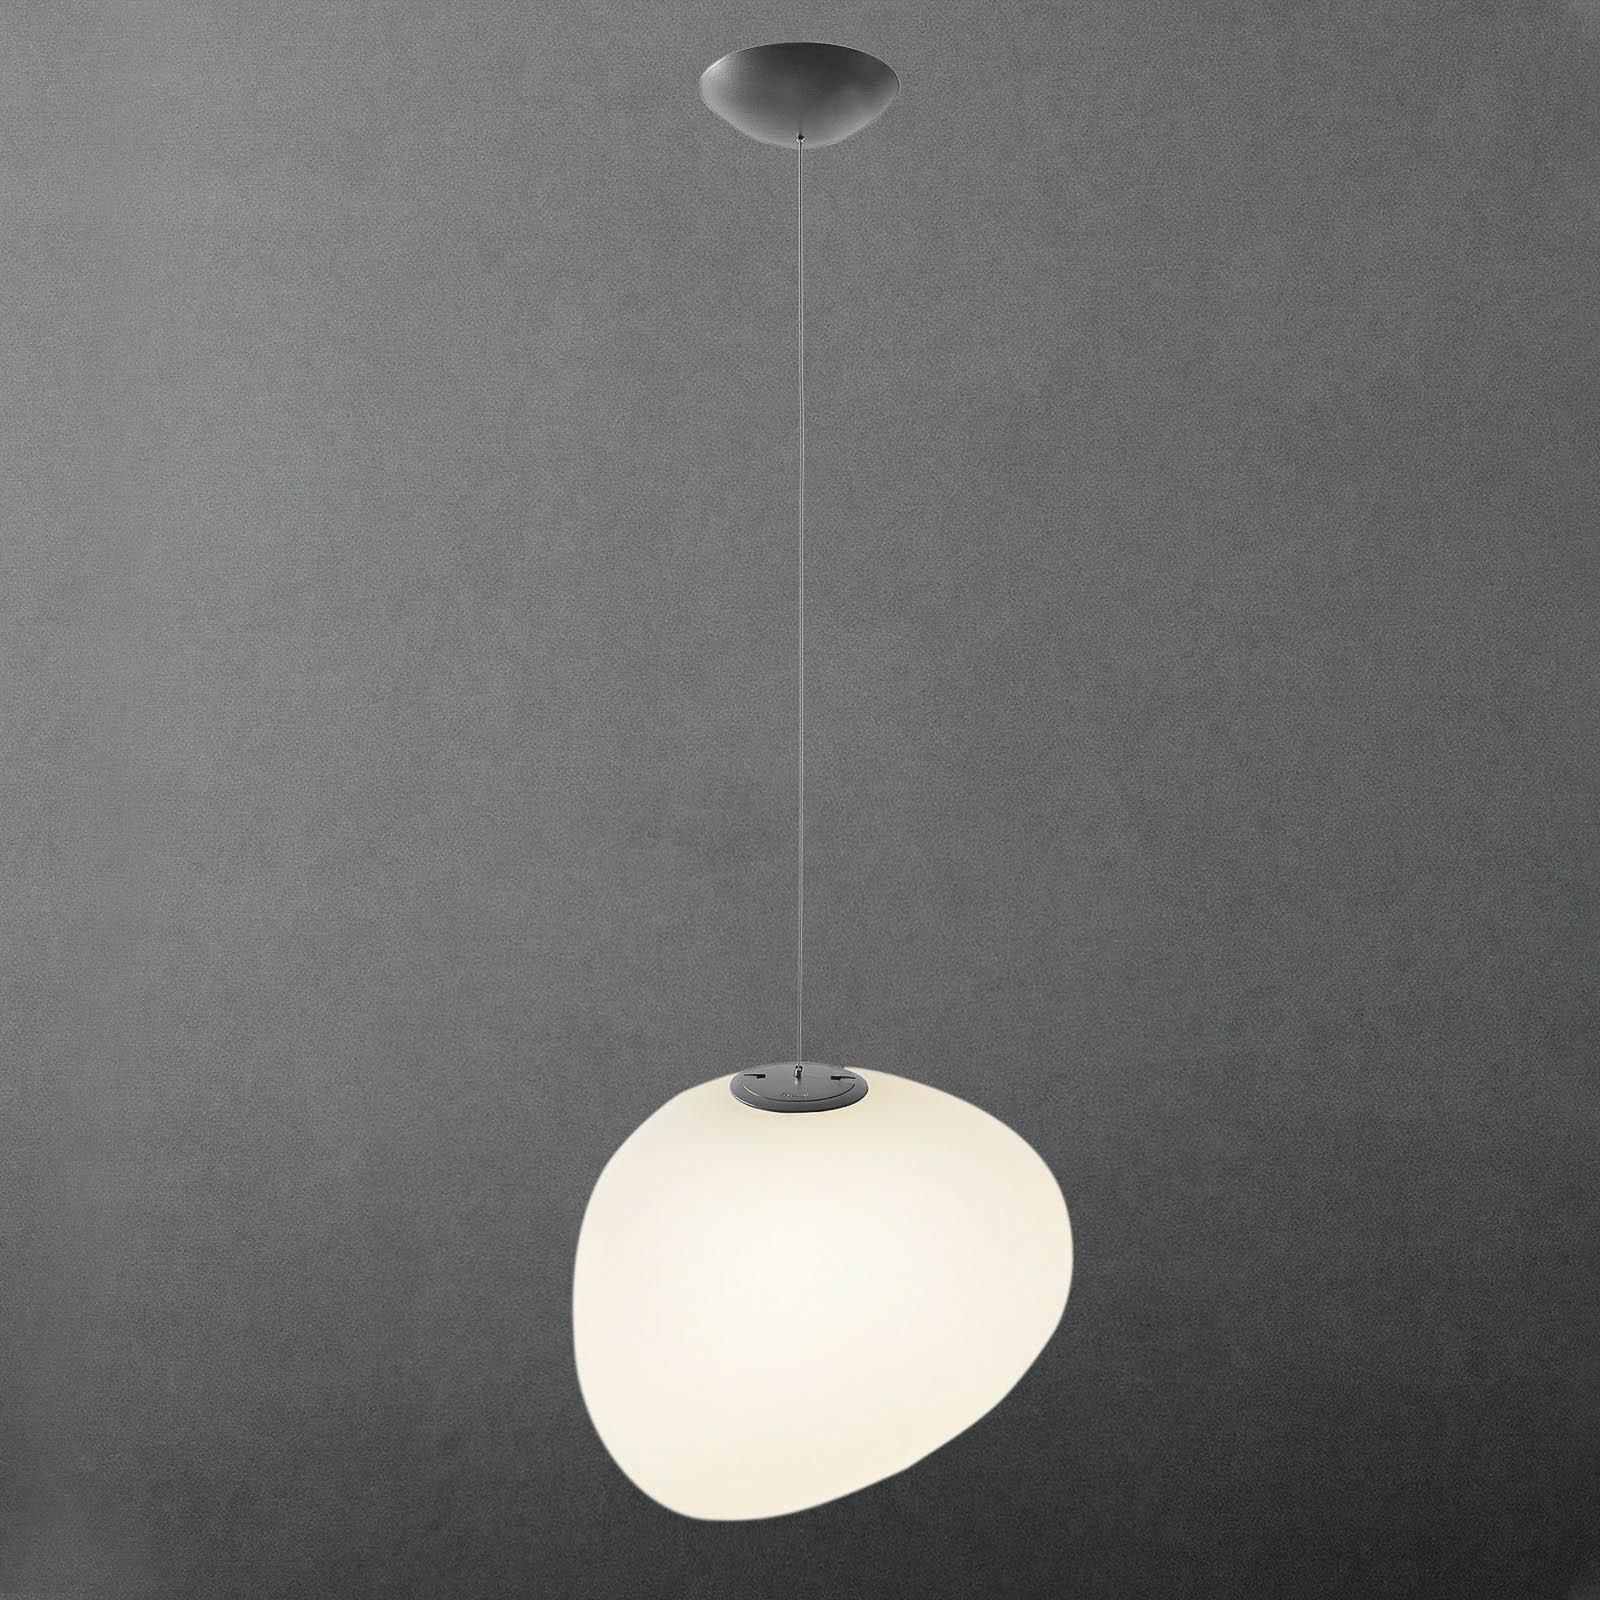 Foscarini Gregg piccola hængelampe, grafit